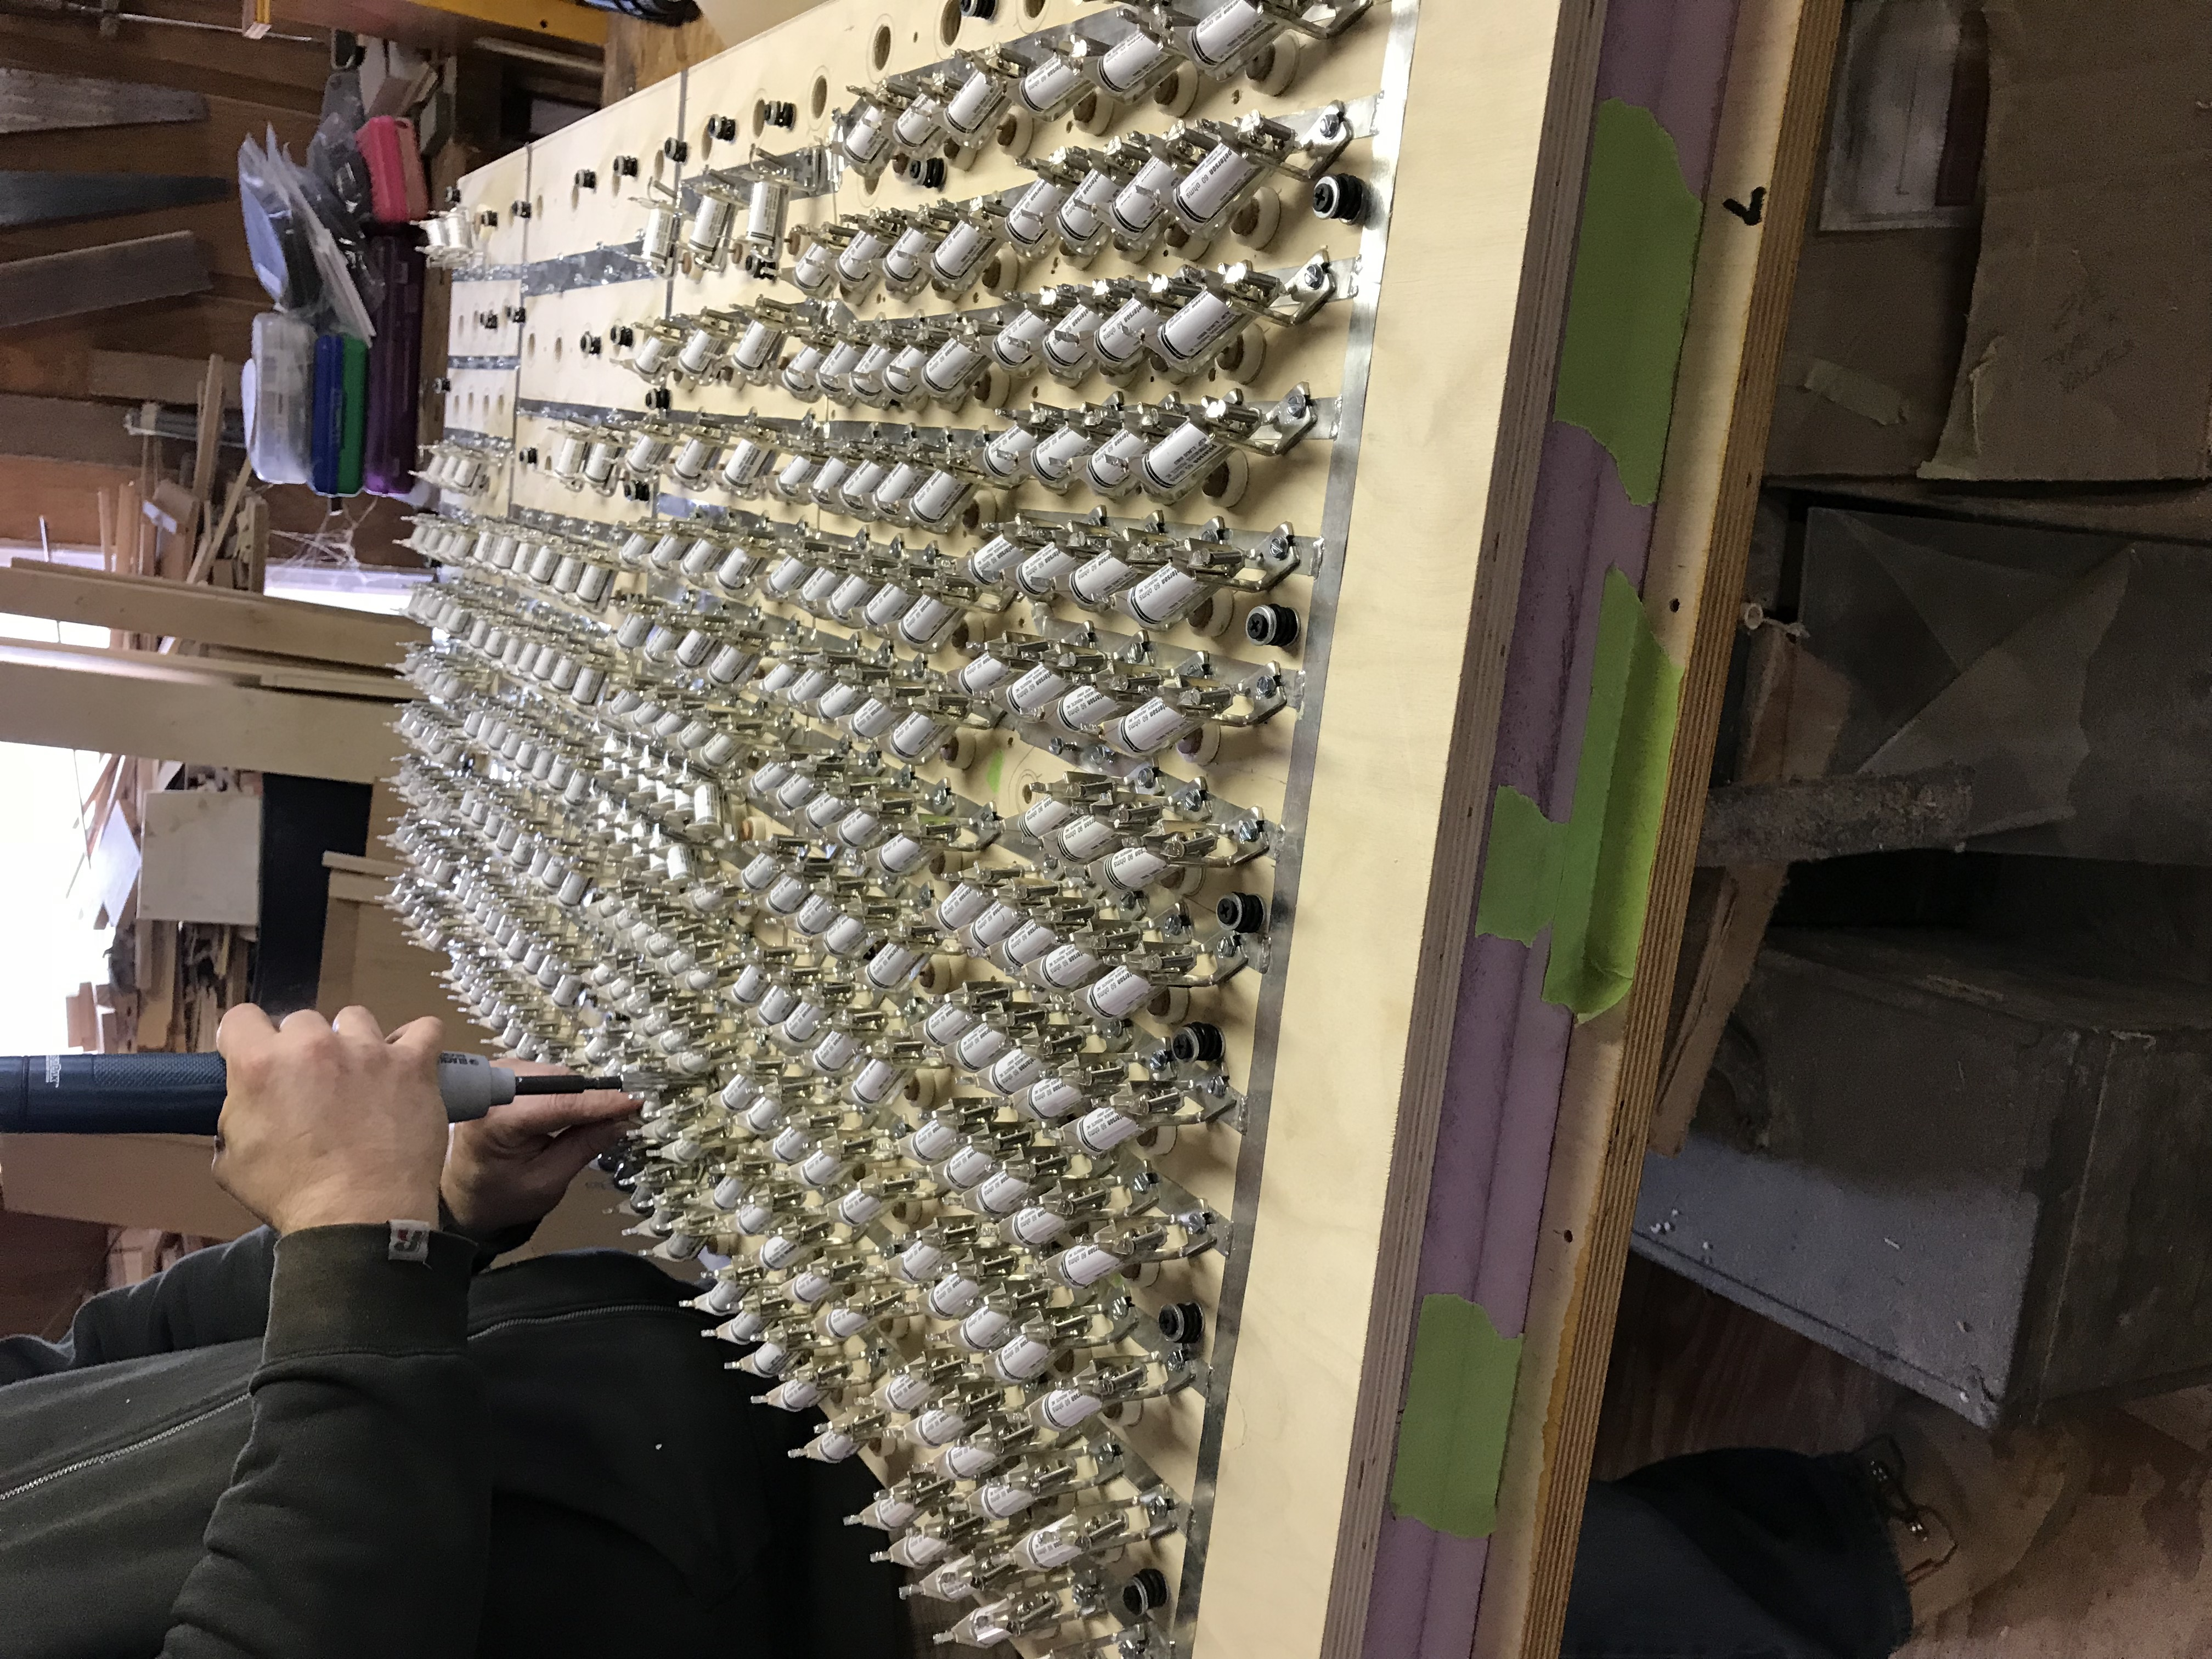 Installing valves